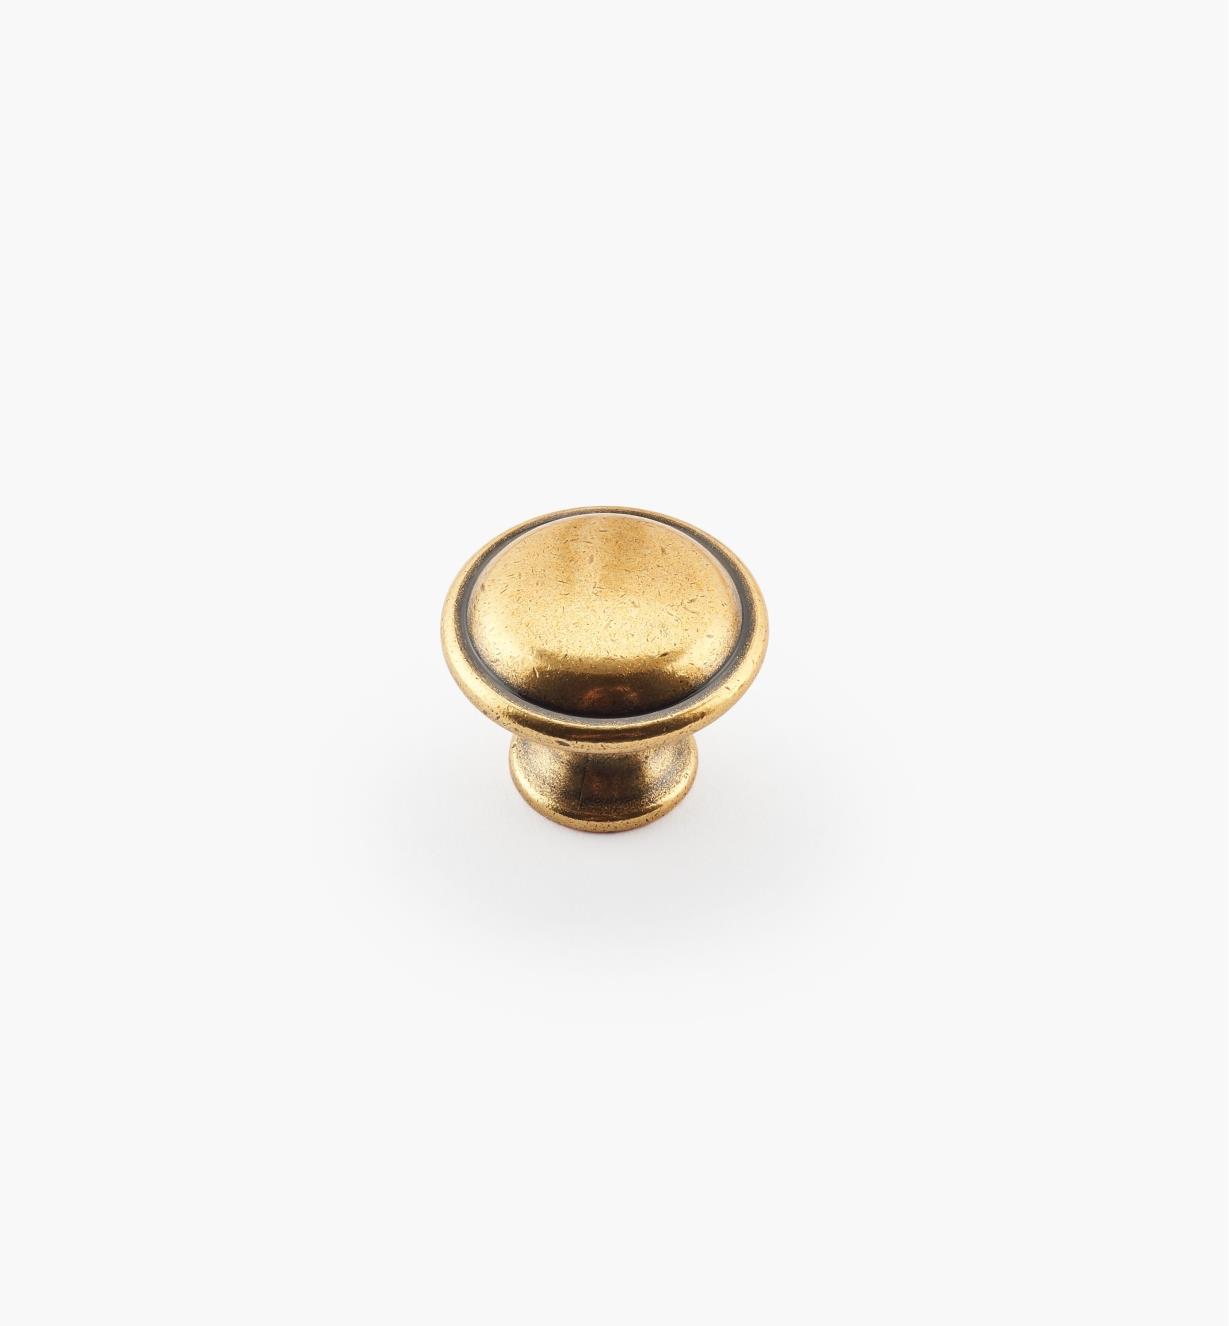 01A2074 - Bouton de 25 mm x 20mm, sérieContemporaineII, finibronzebruni